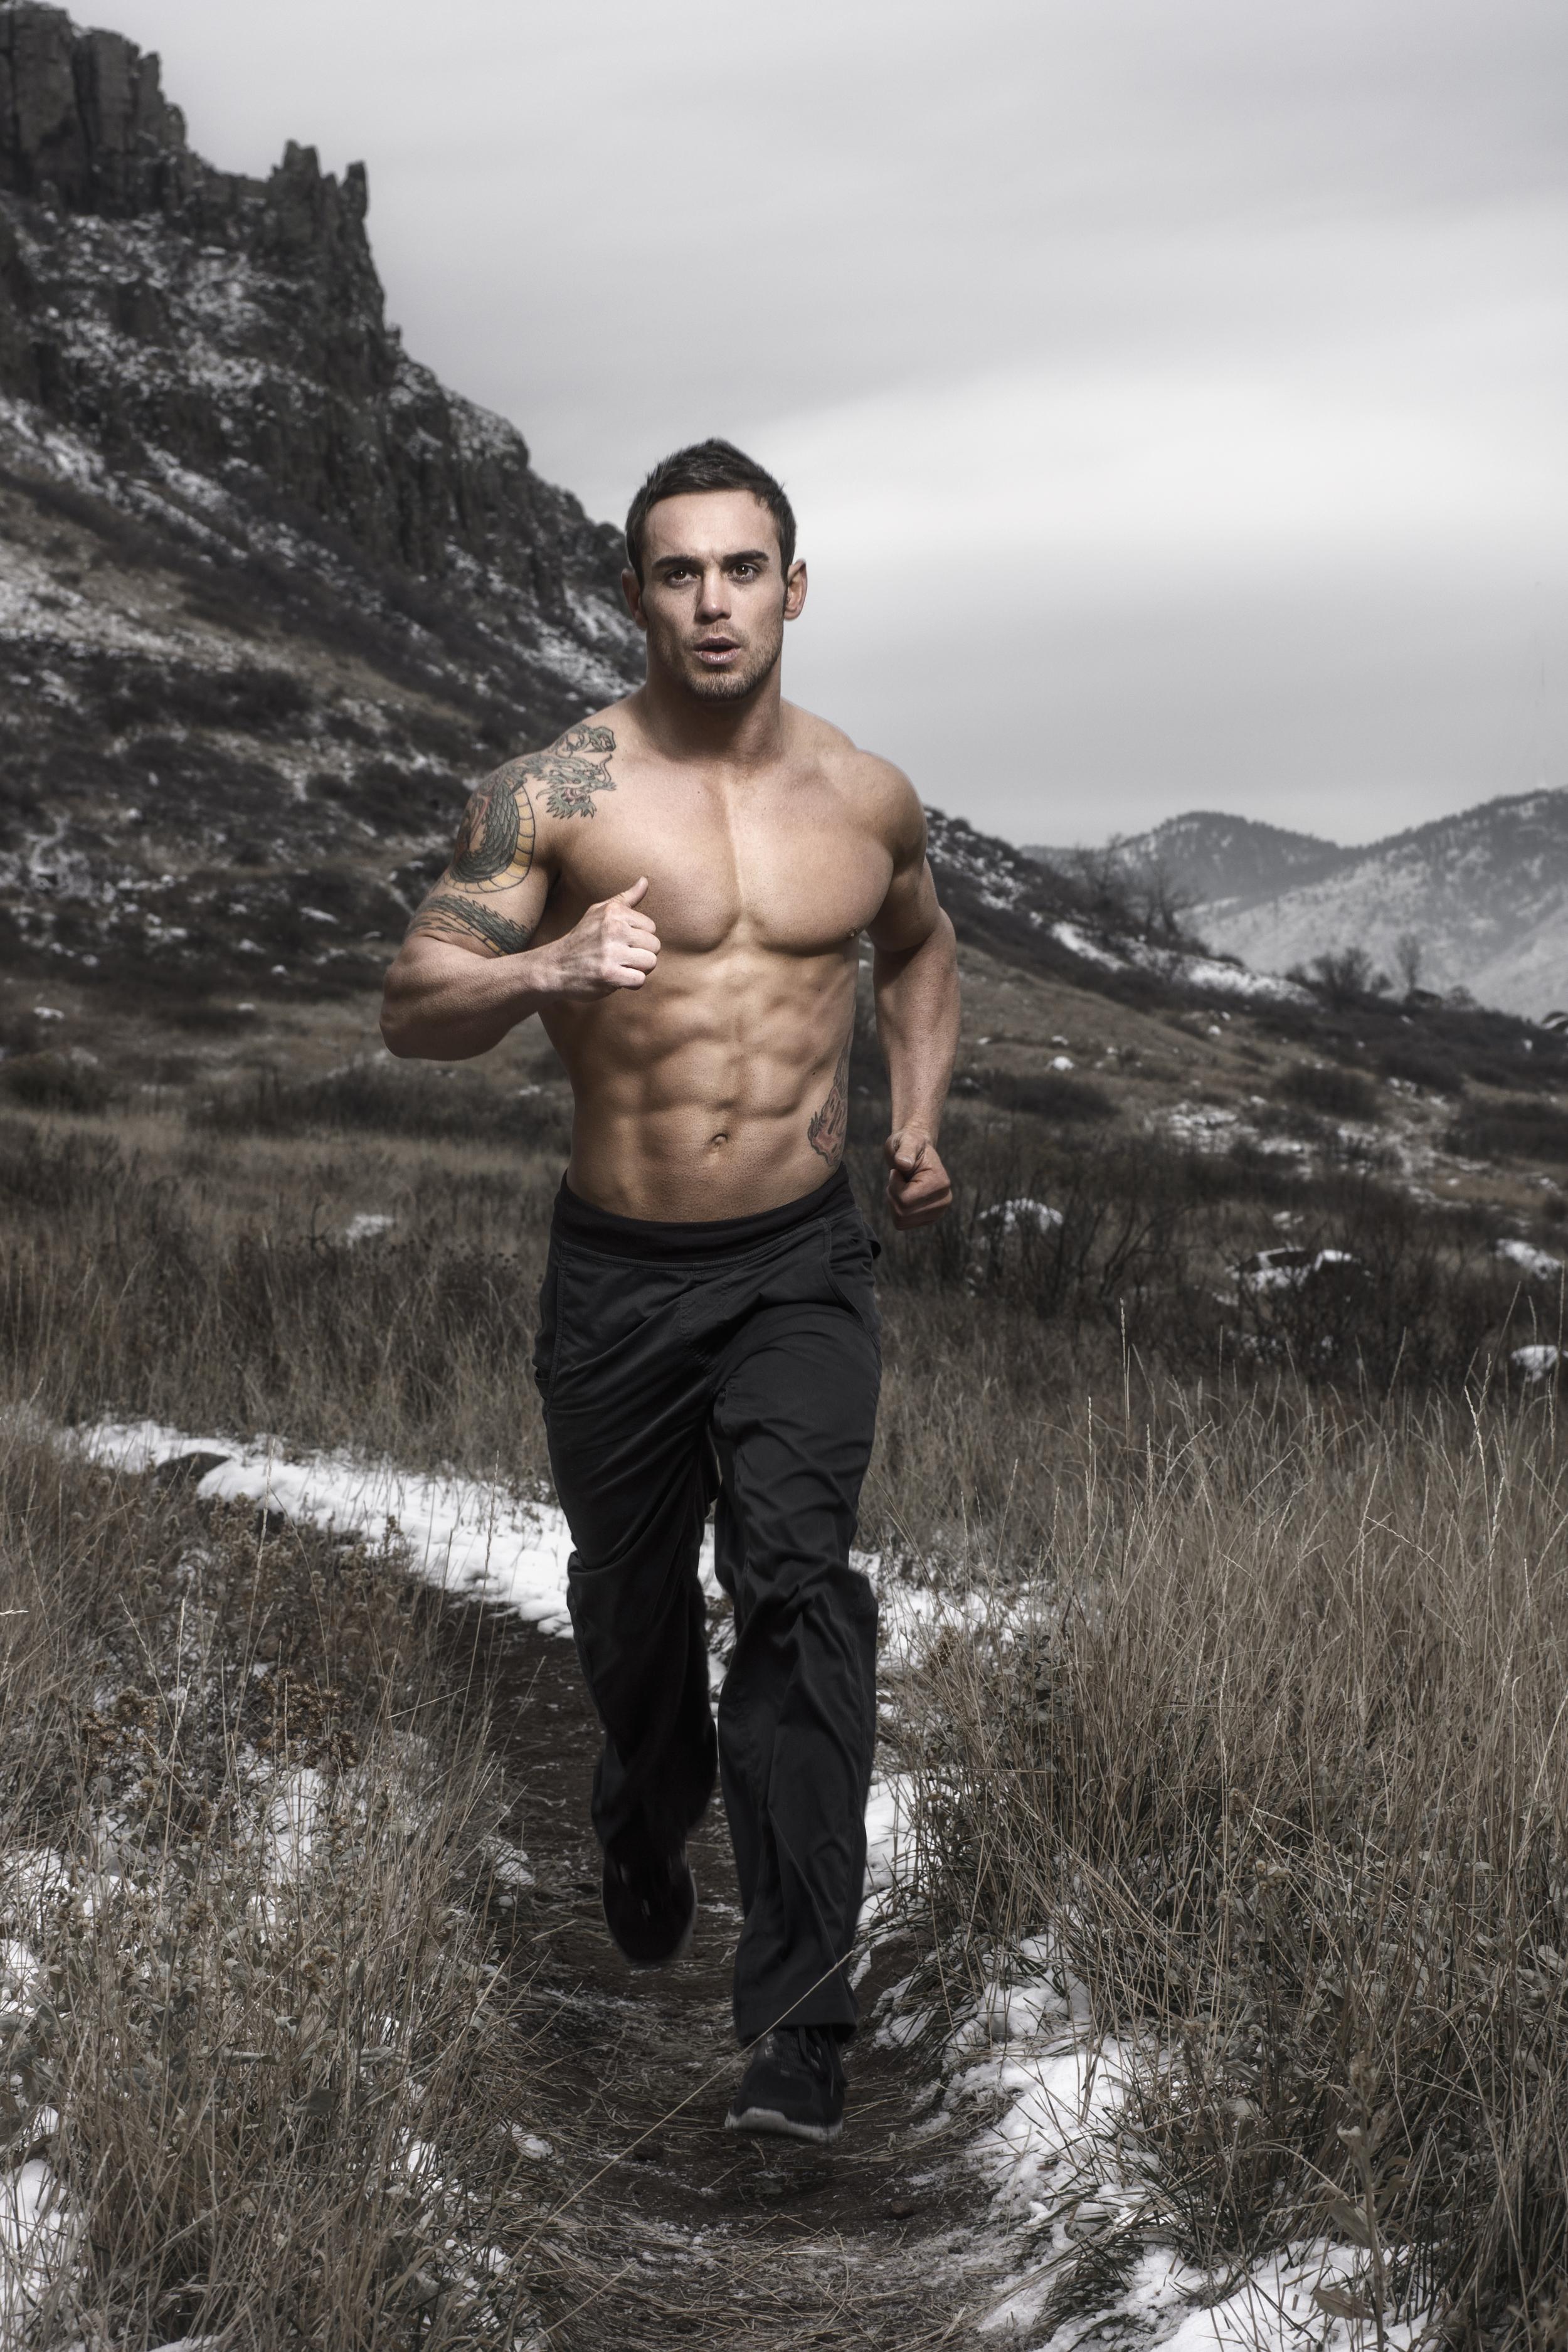 flex5-staying-fit-healthy-training-nutrition-blog-charlotte.jpg